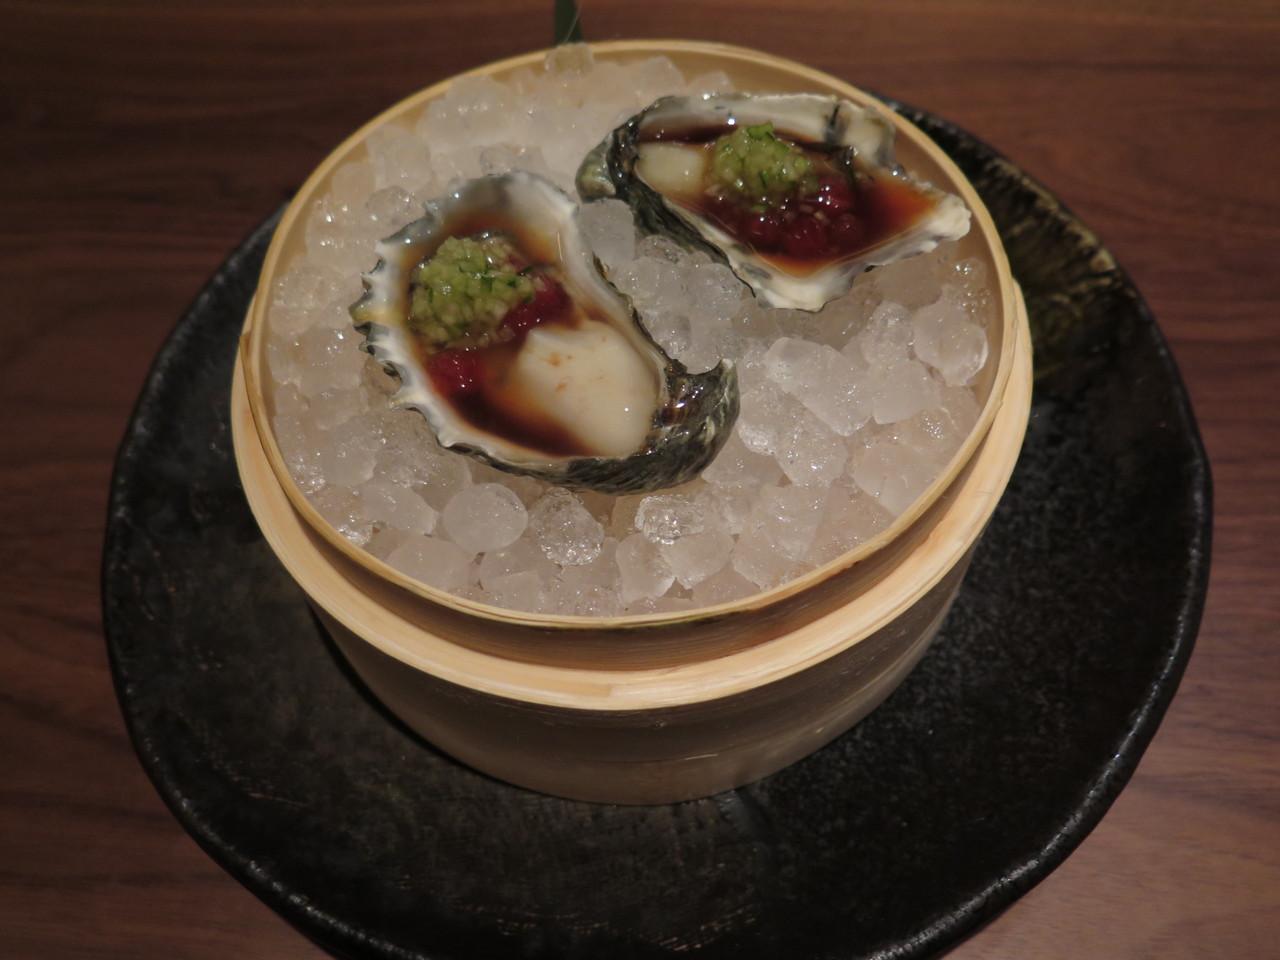 KUMAMOTO OYSTER ponzu watermelon pearls, cucumber mignonette